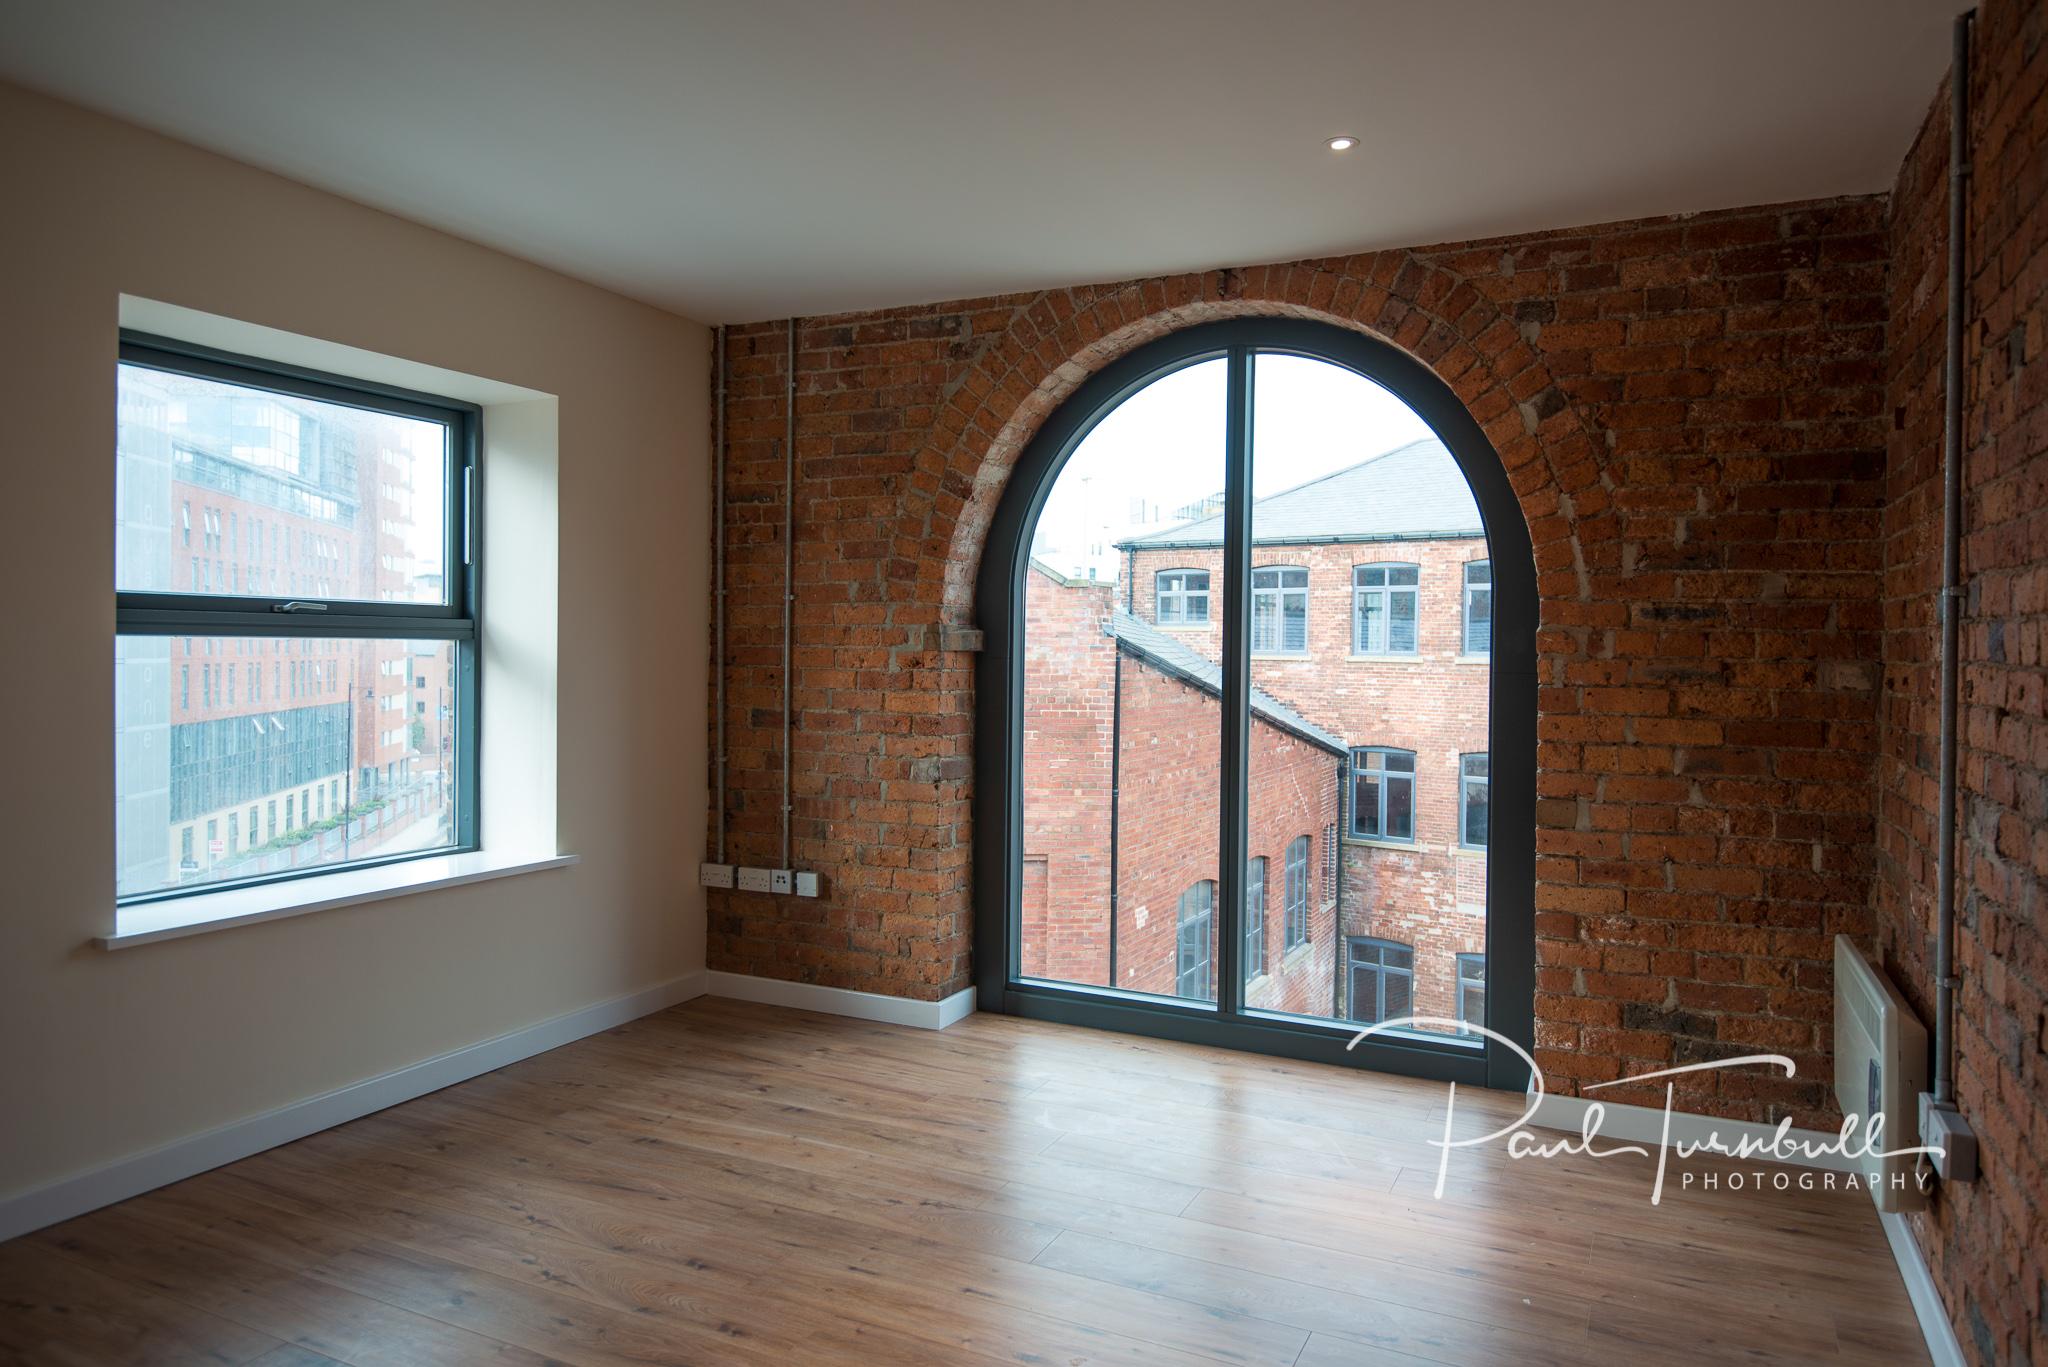 commercial-property-photographer-leeds-yorkshire-blackbrook-developments-032.jpg